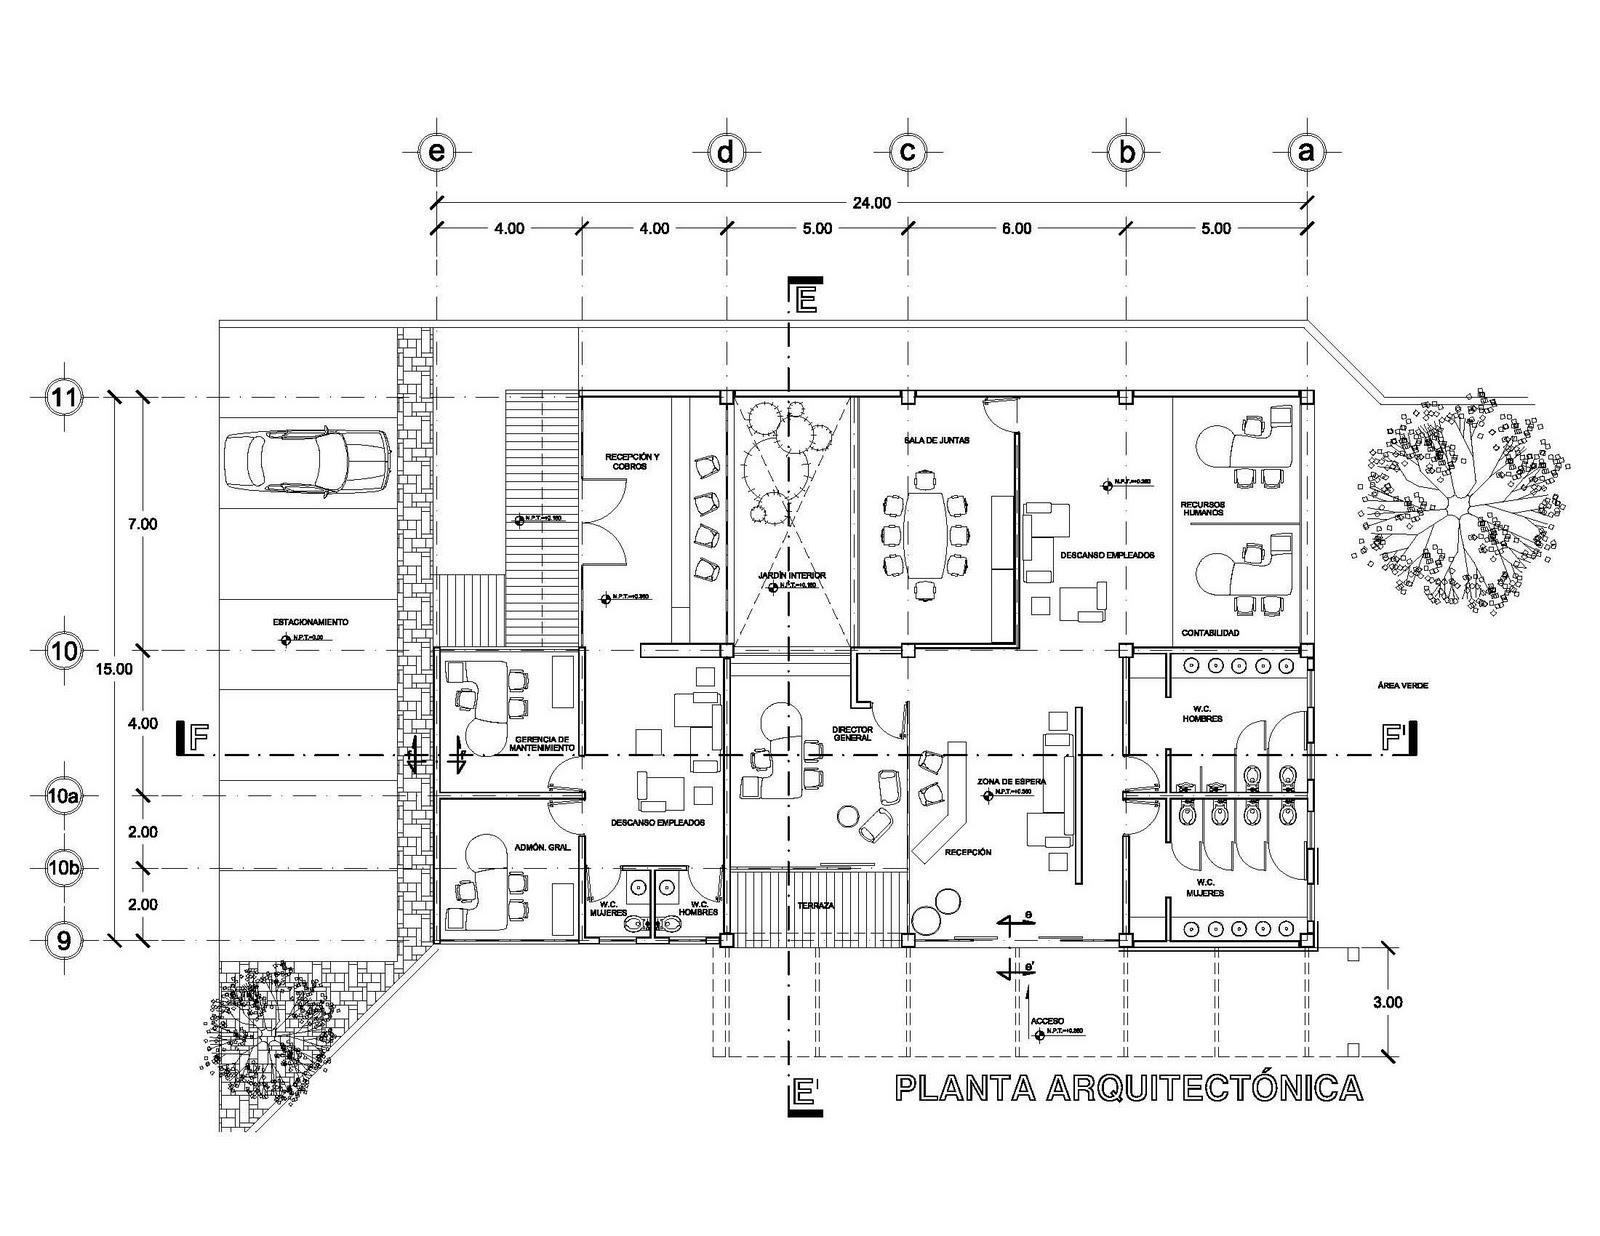 Planos arquitectonicos sena octubre 2011 for Proyecto arquitectonico pdf